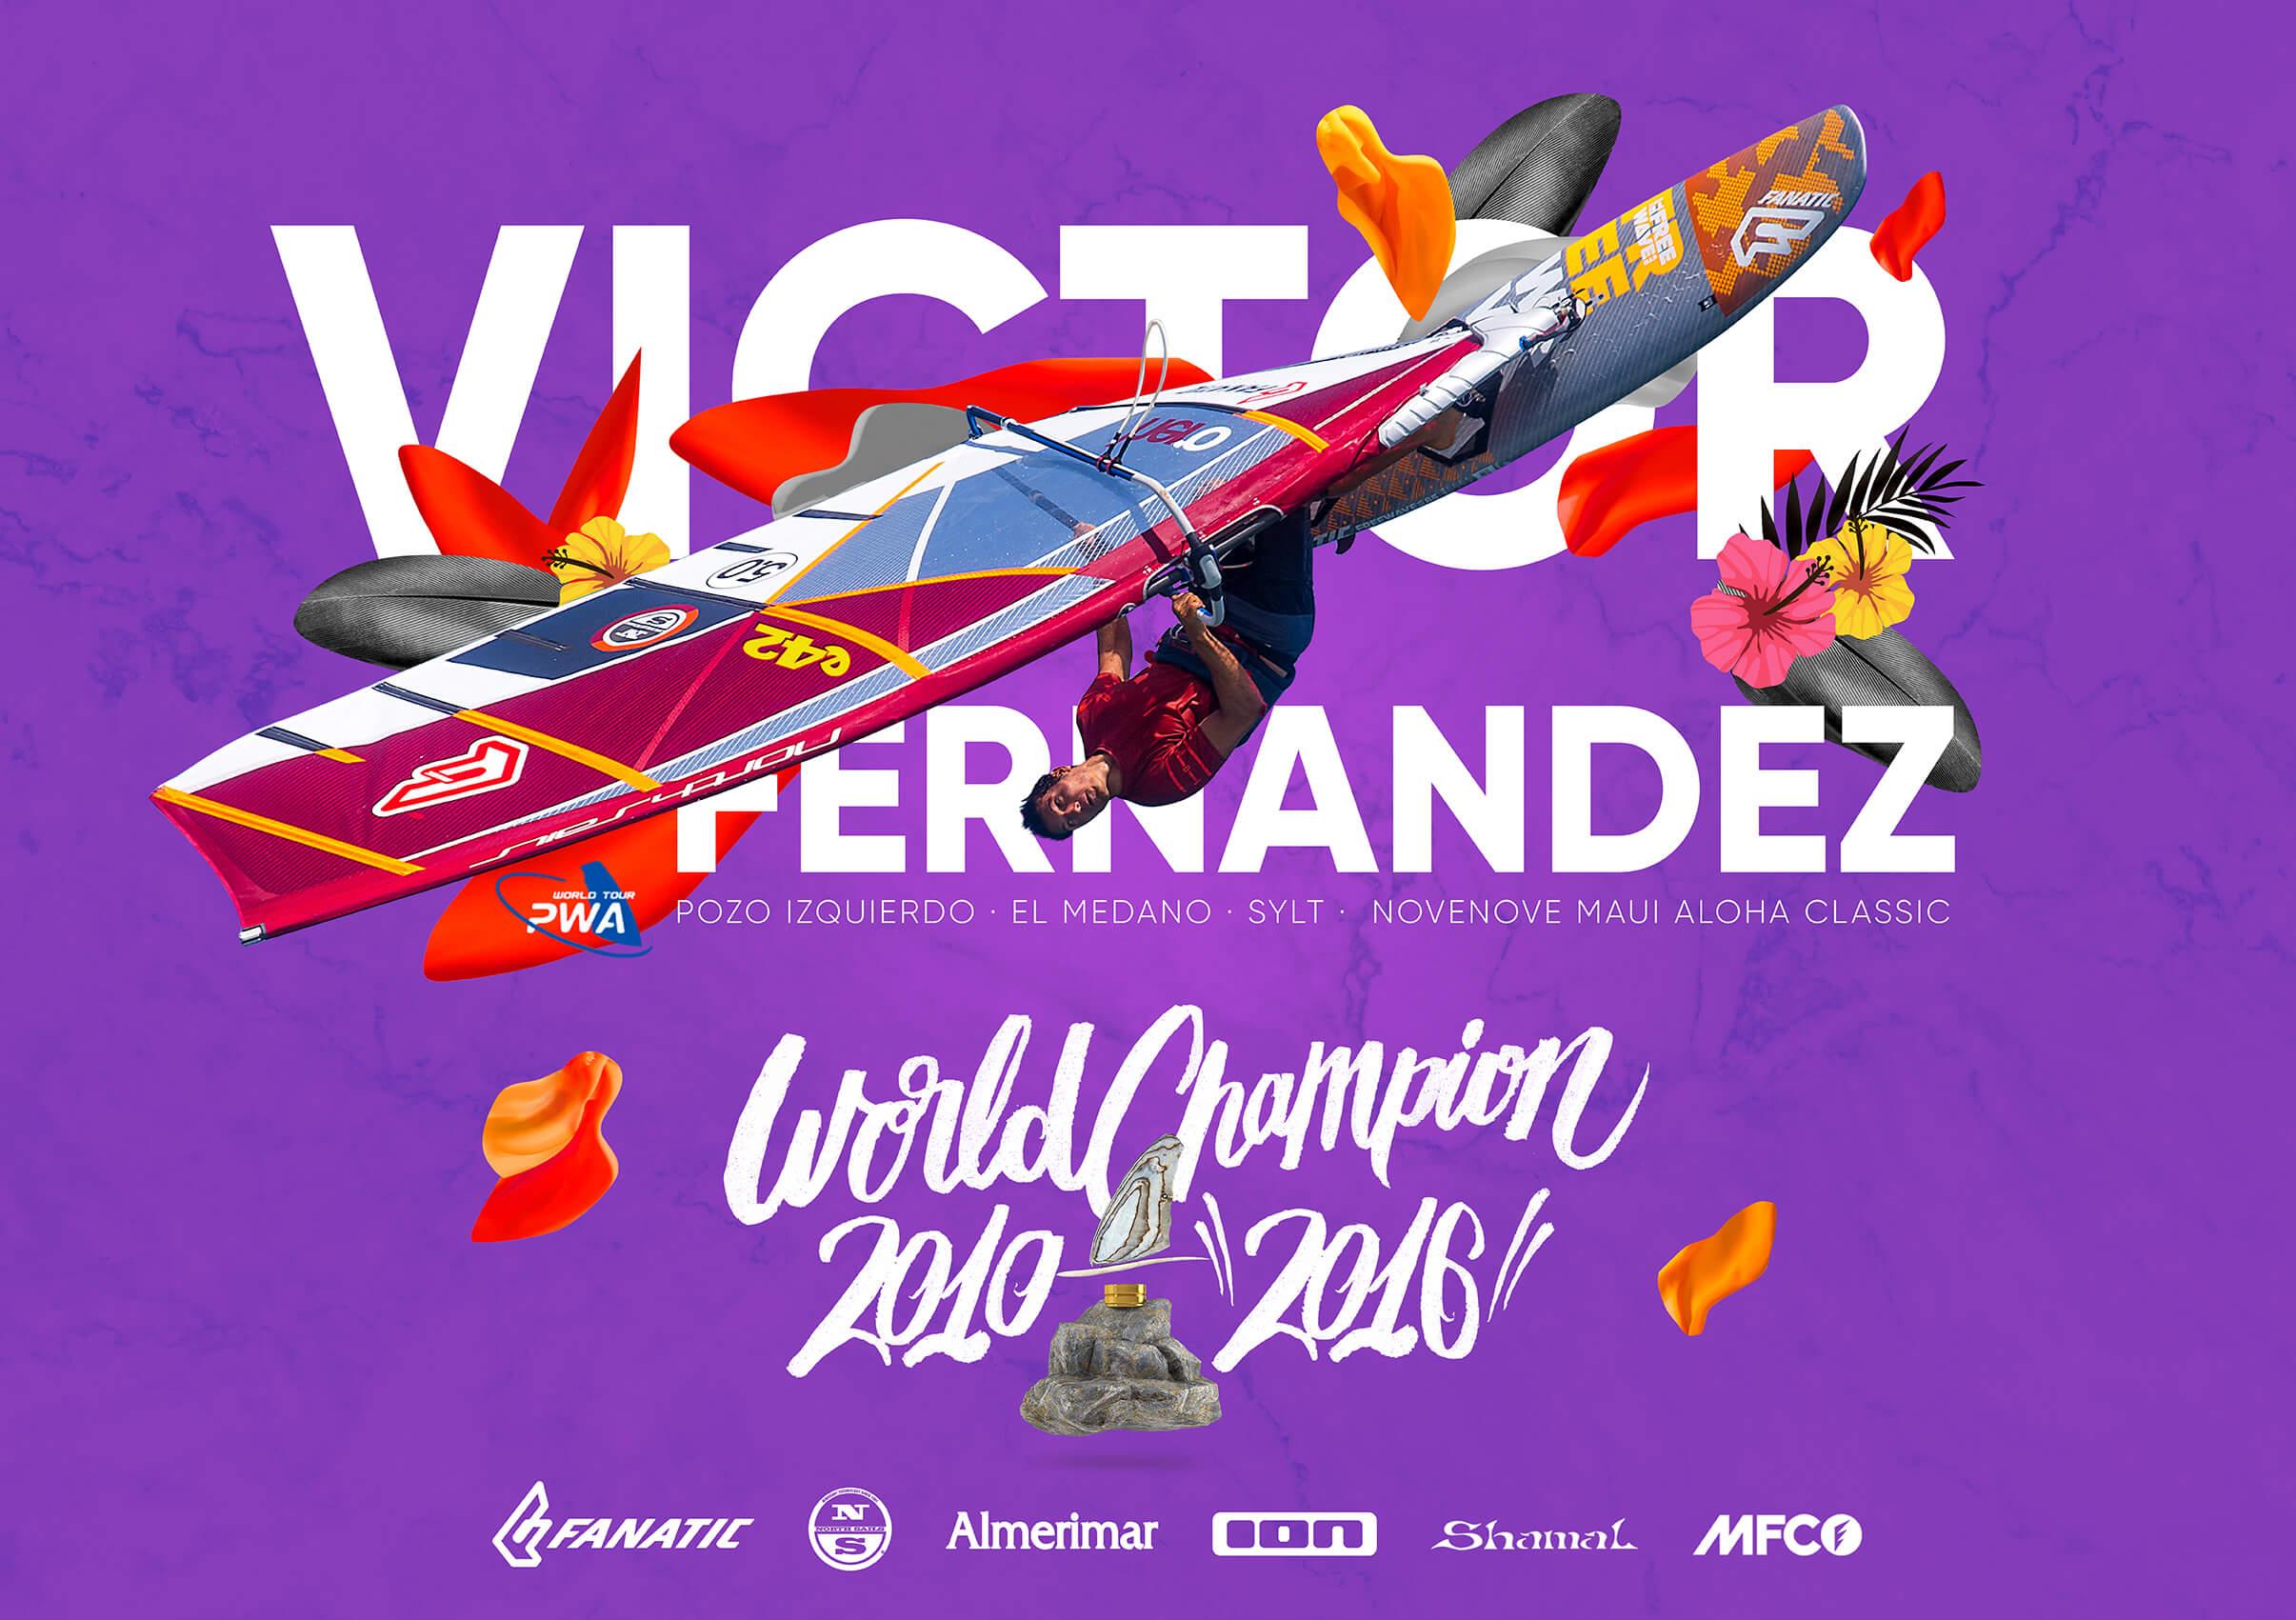 World Champion Windsurf 2016